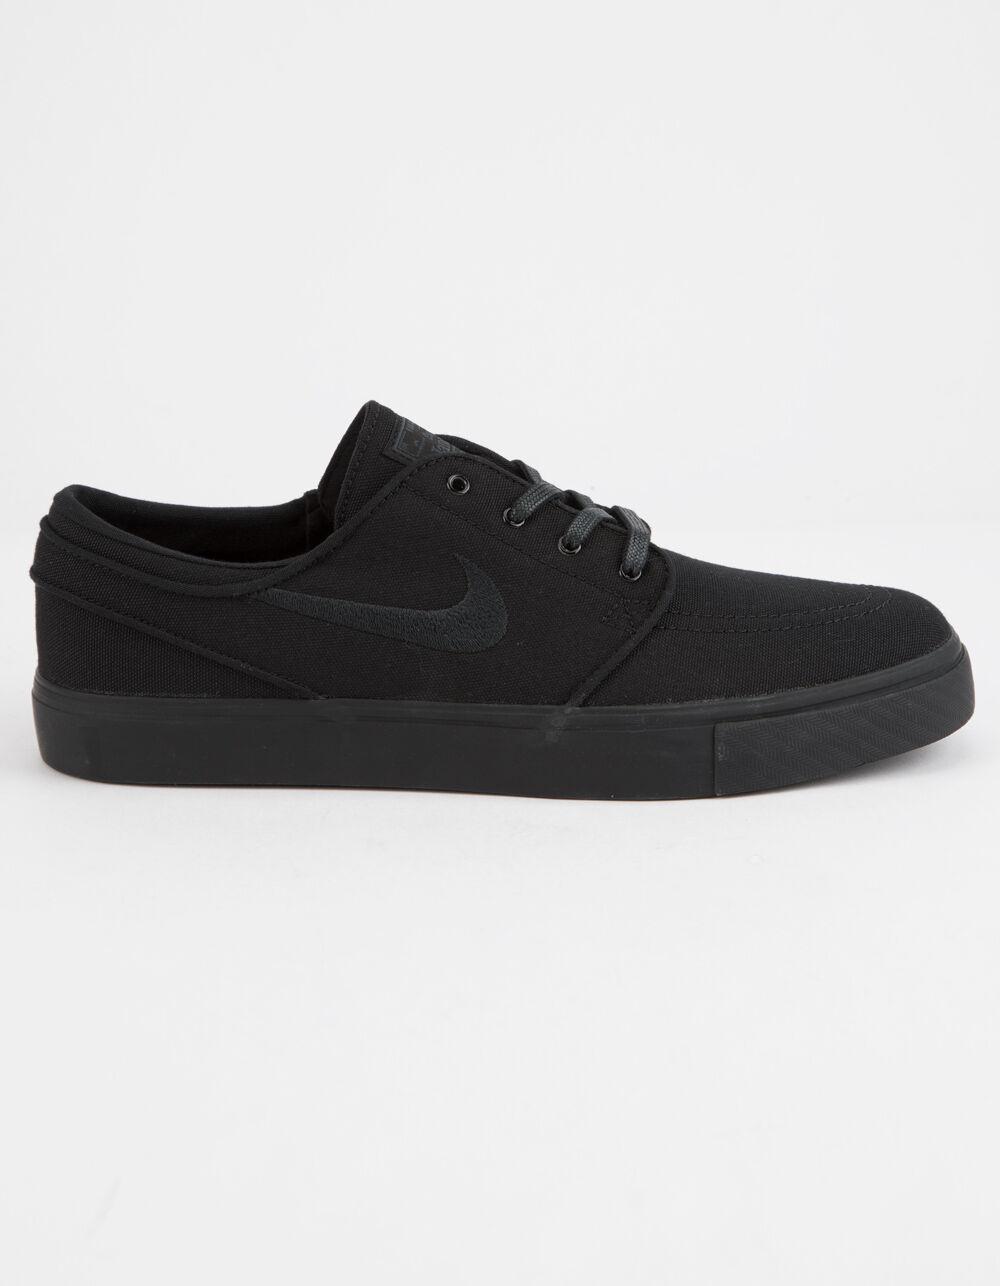 NIKE SB Zoom Stefan Janoski Canvas Black & Black Shoes